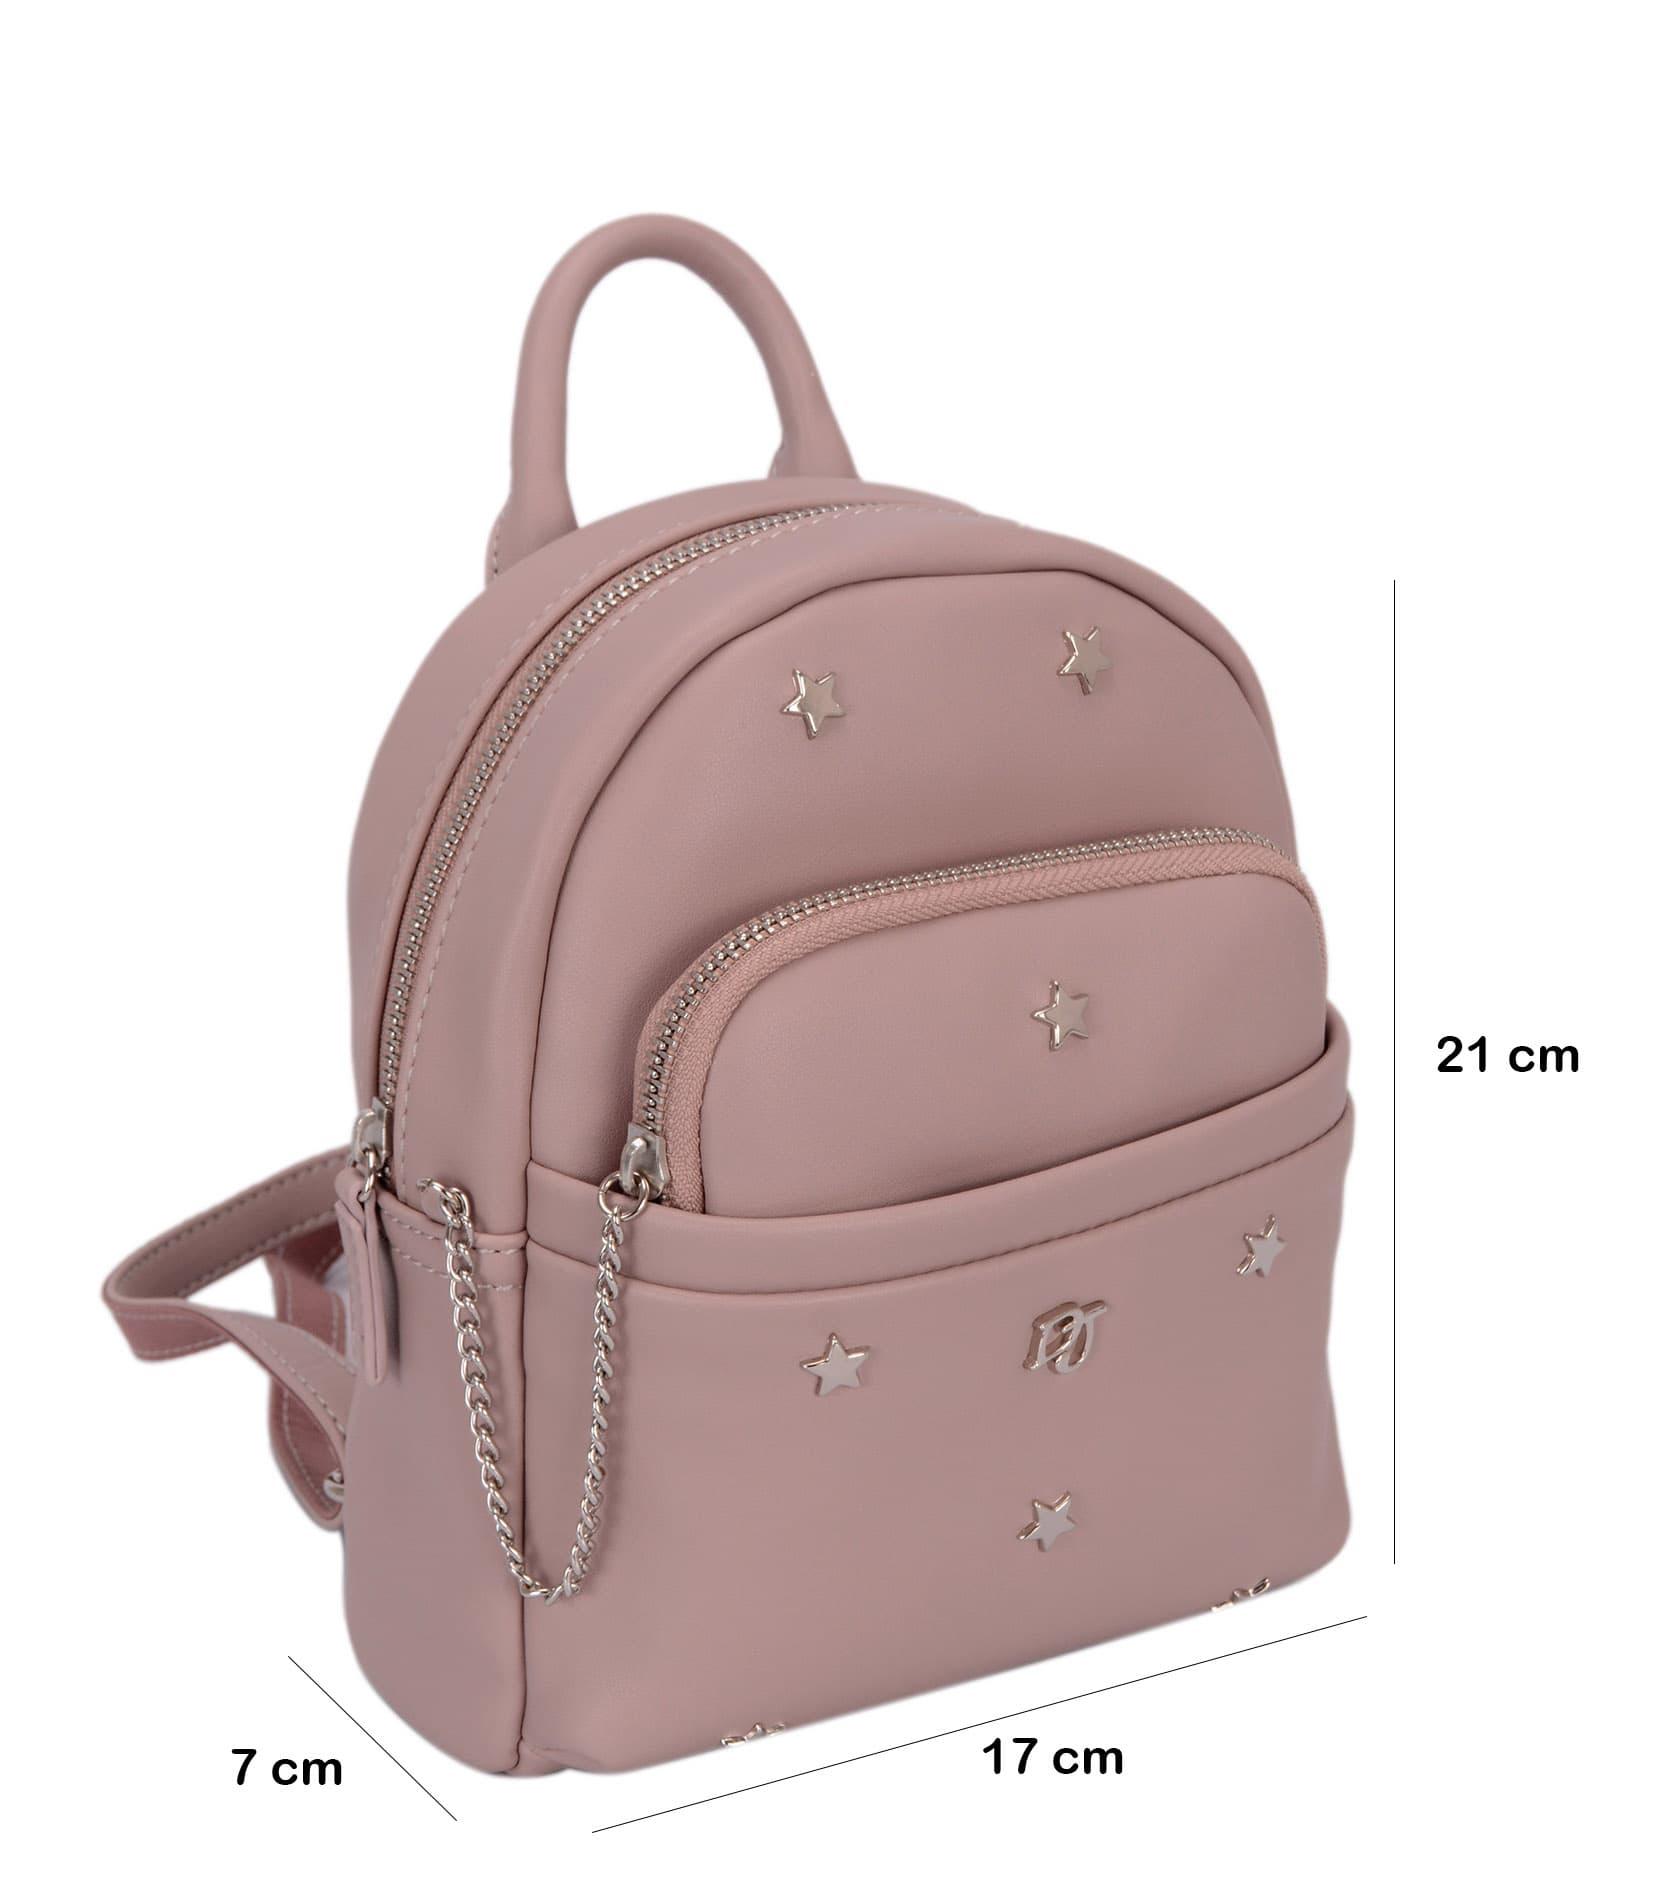 97a049daa74 Jual Davidjones Cm3701 Tas Punggung Backpack Ransel Mini Kulit Impor ...